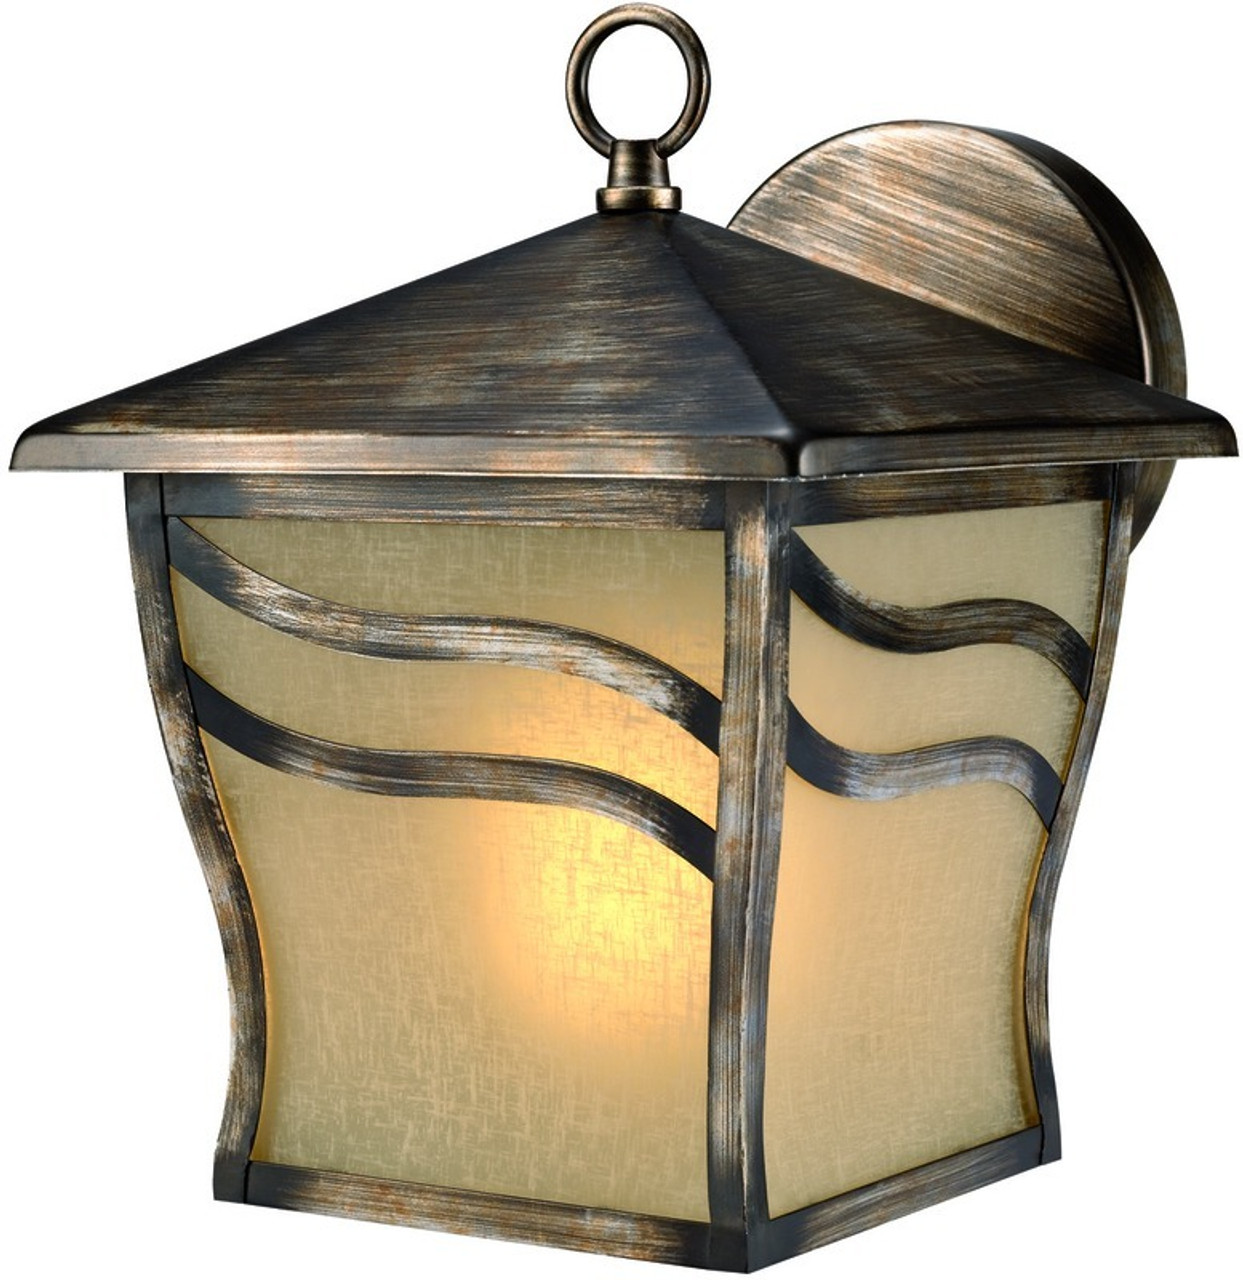 Hardware House Royal Bronze Patio Outdoor Light Fixture #10-3459